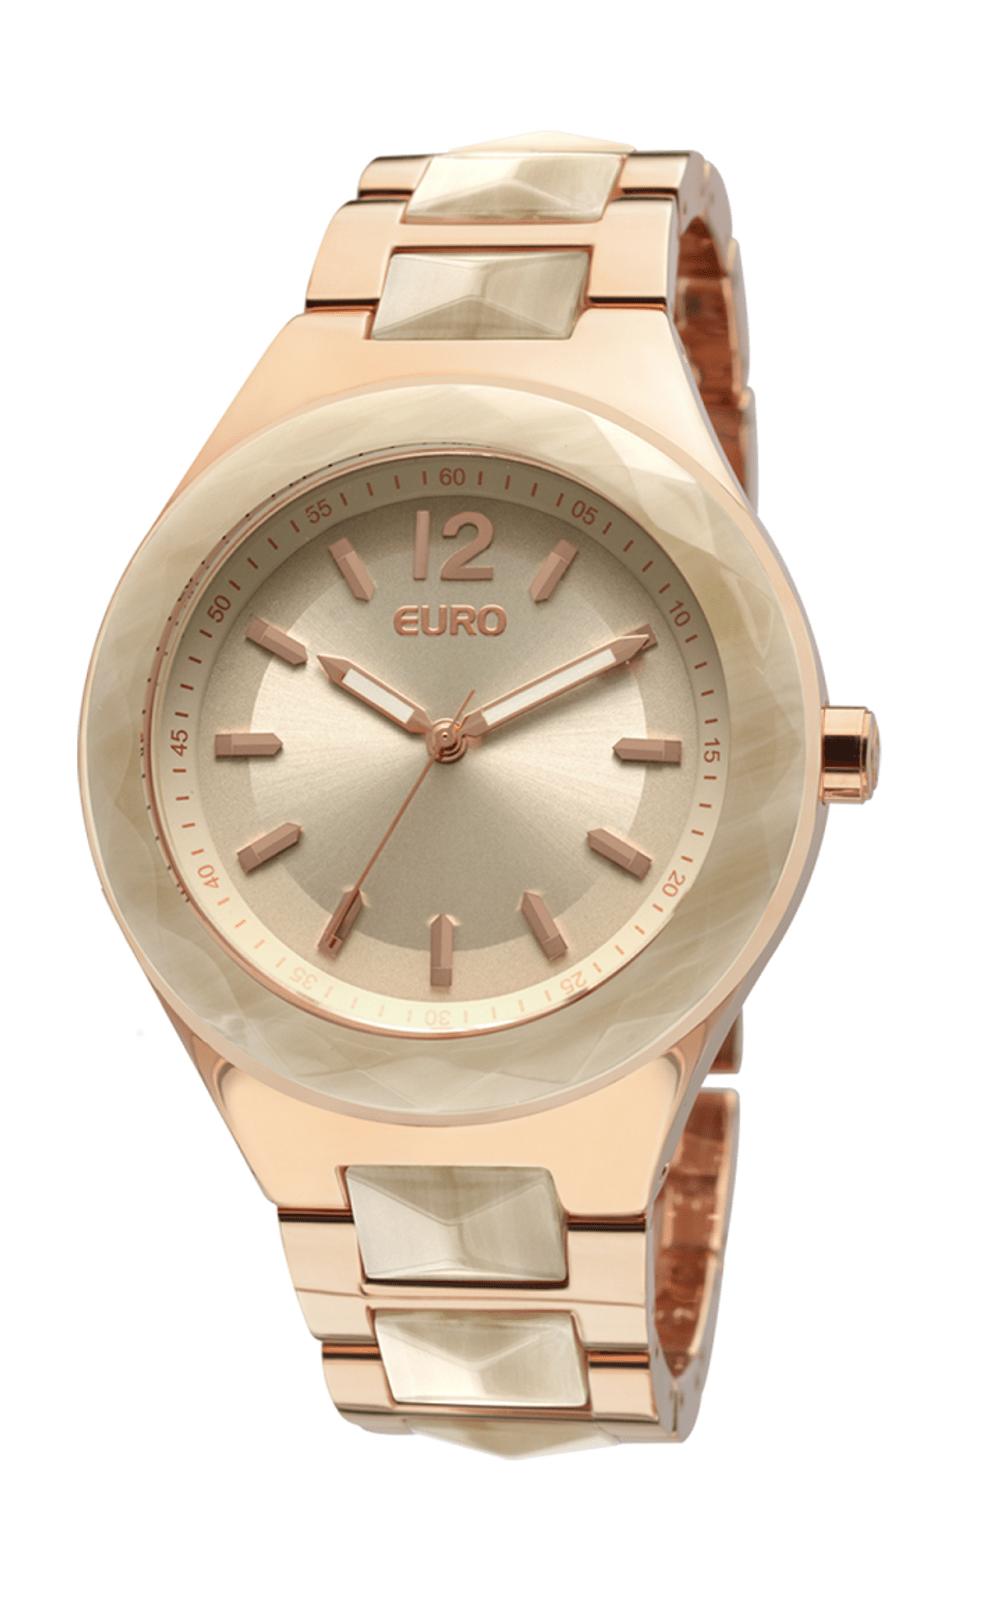 Relógio Euro Feminino Vannes EU2035LRD 4T - Rose Gold. undefined deddfe6cd8